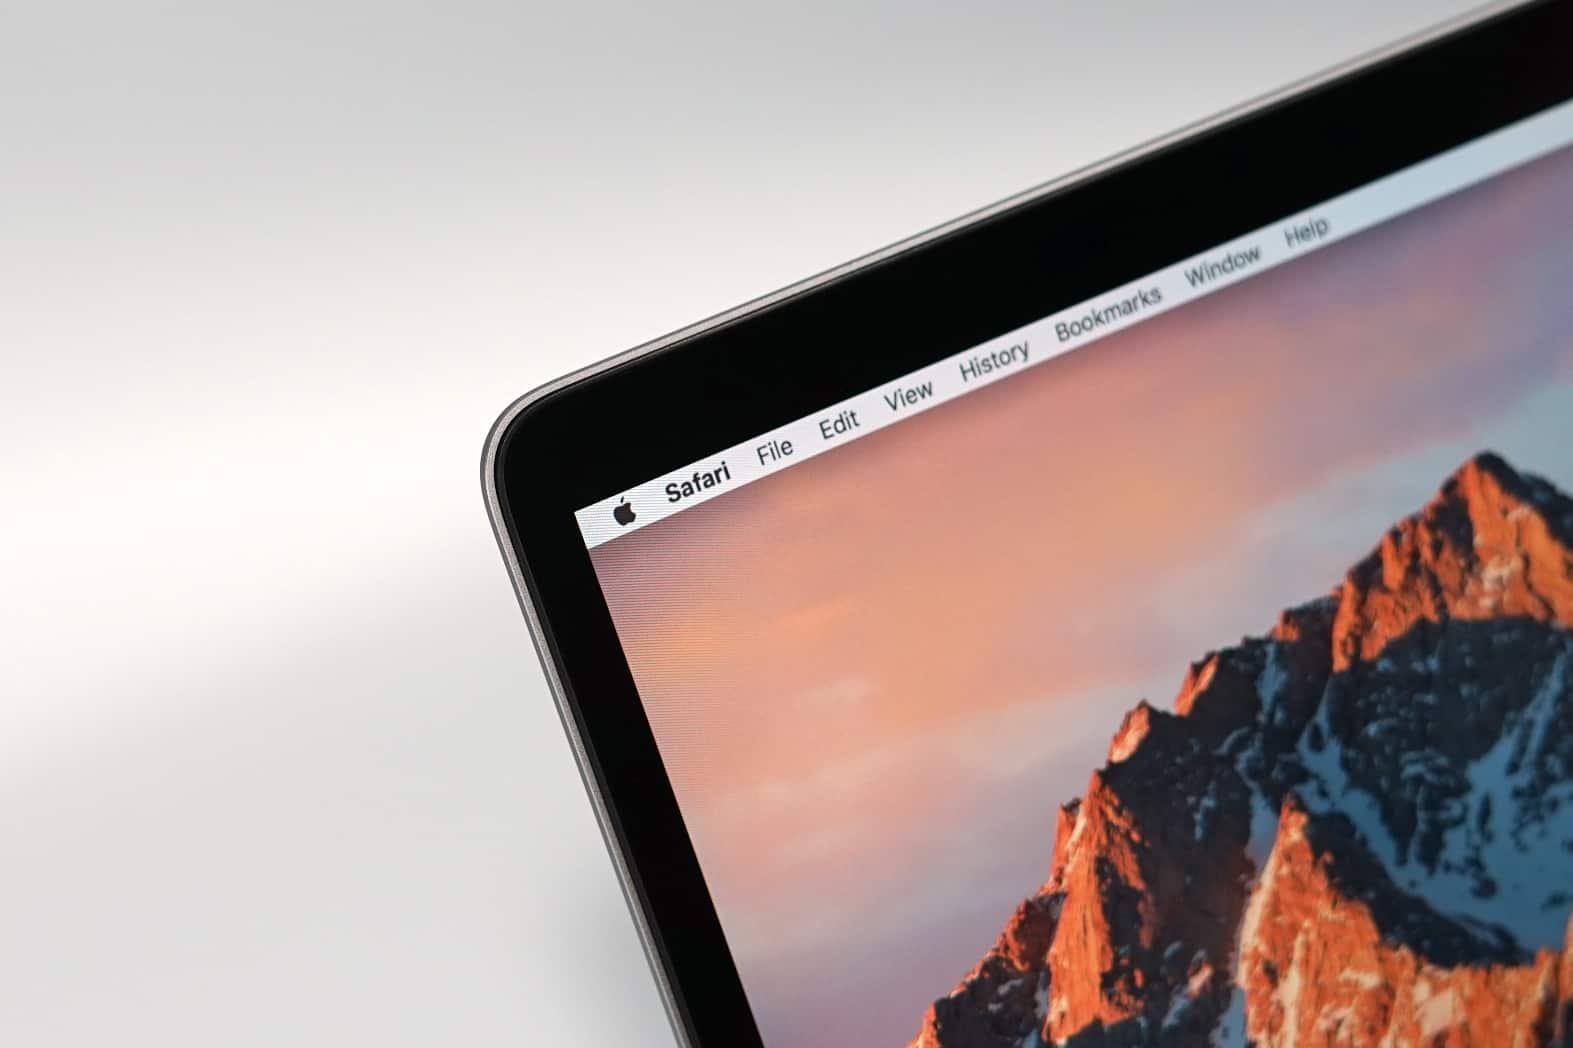 macbook pro mpxt2